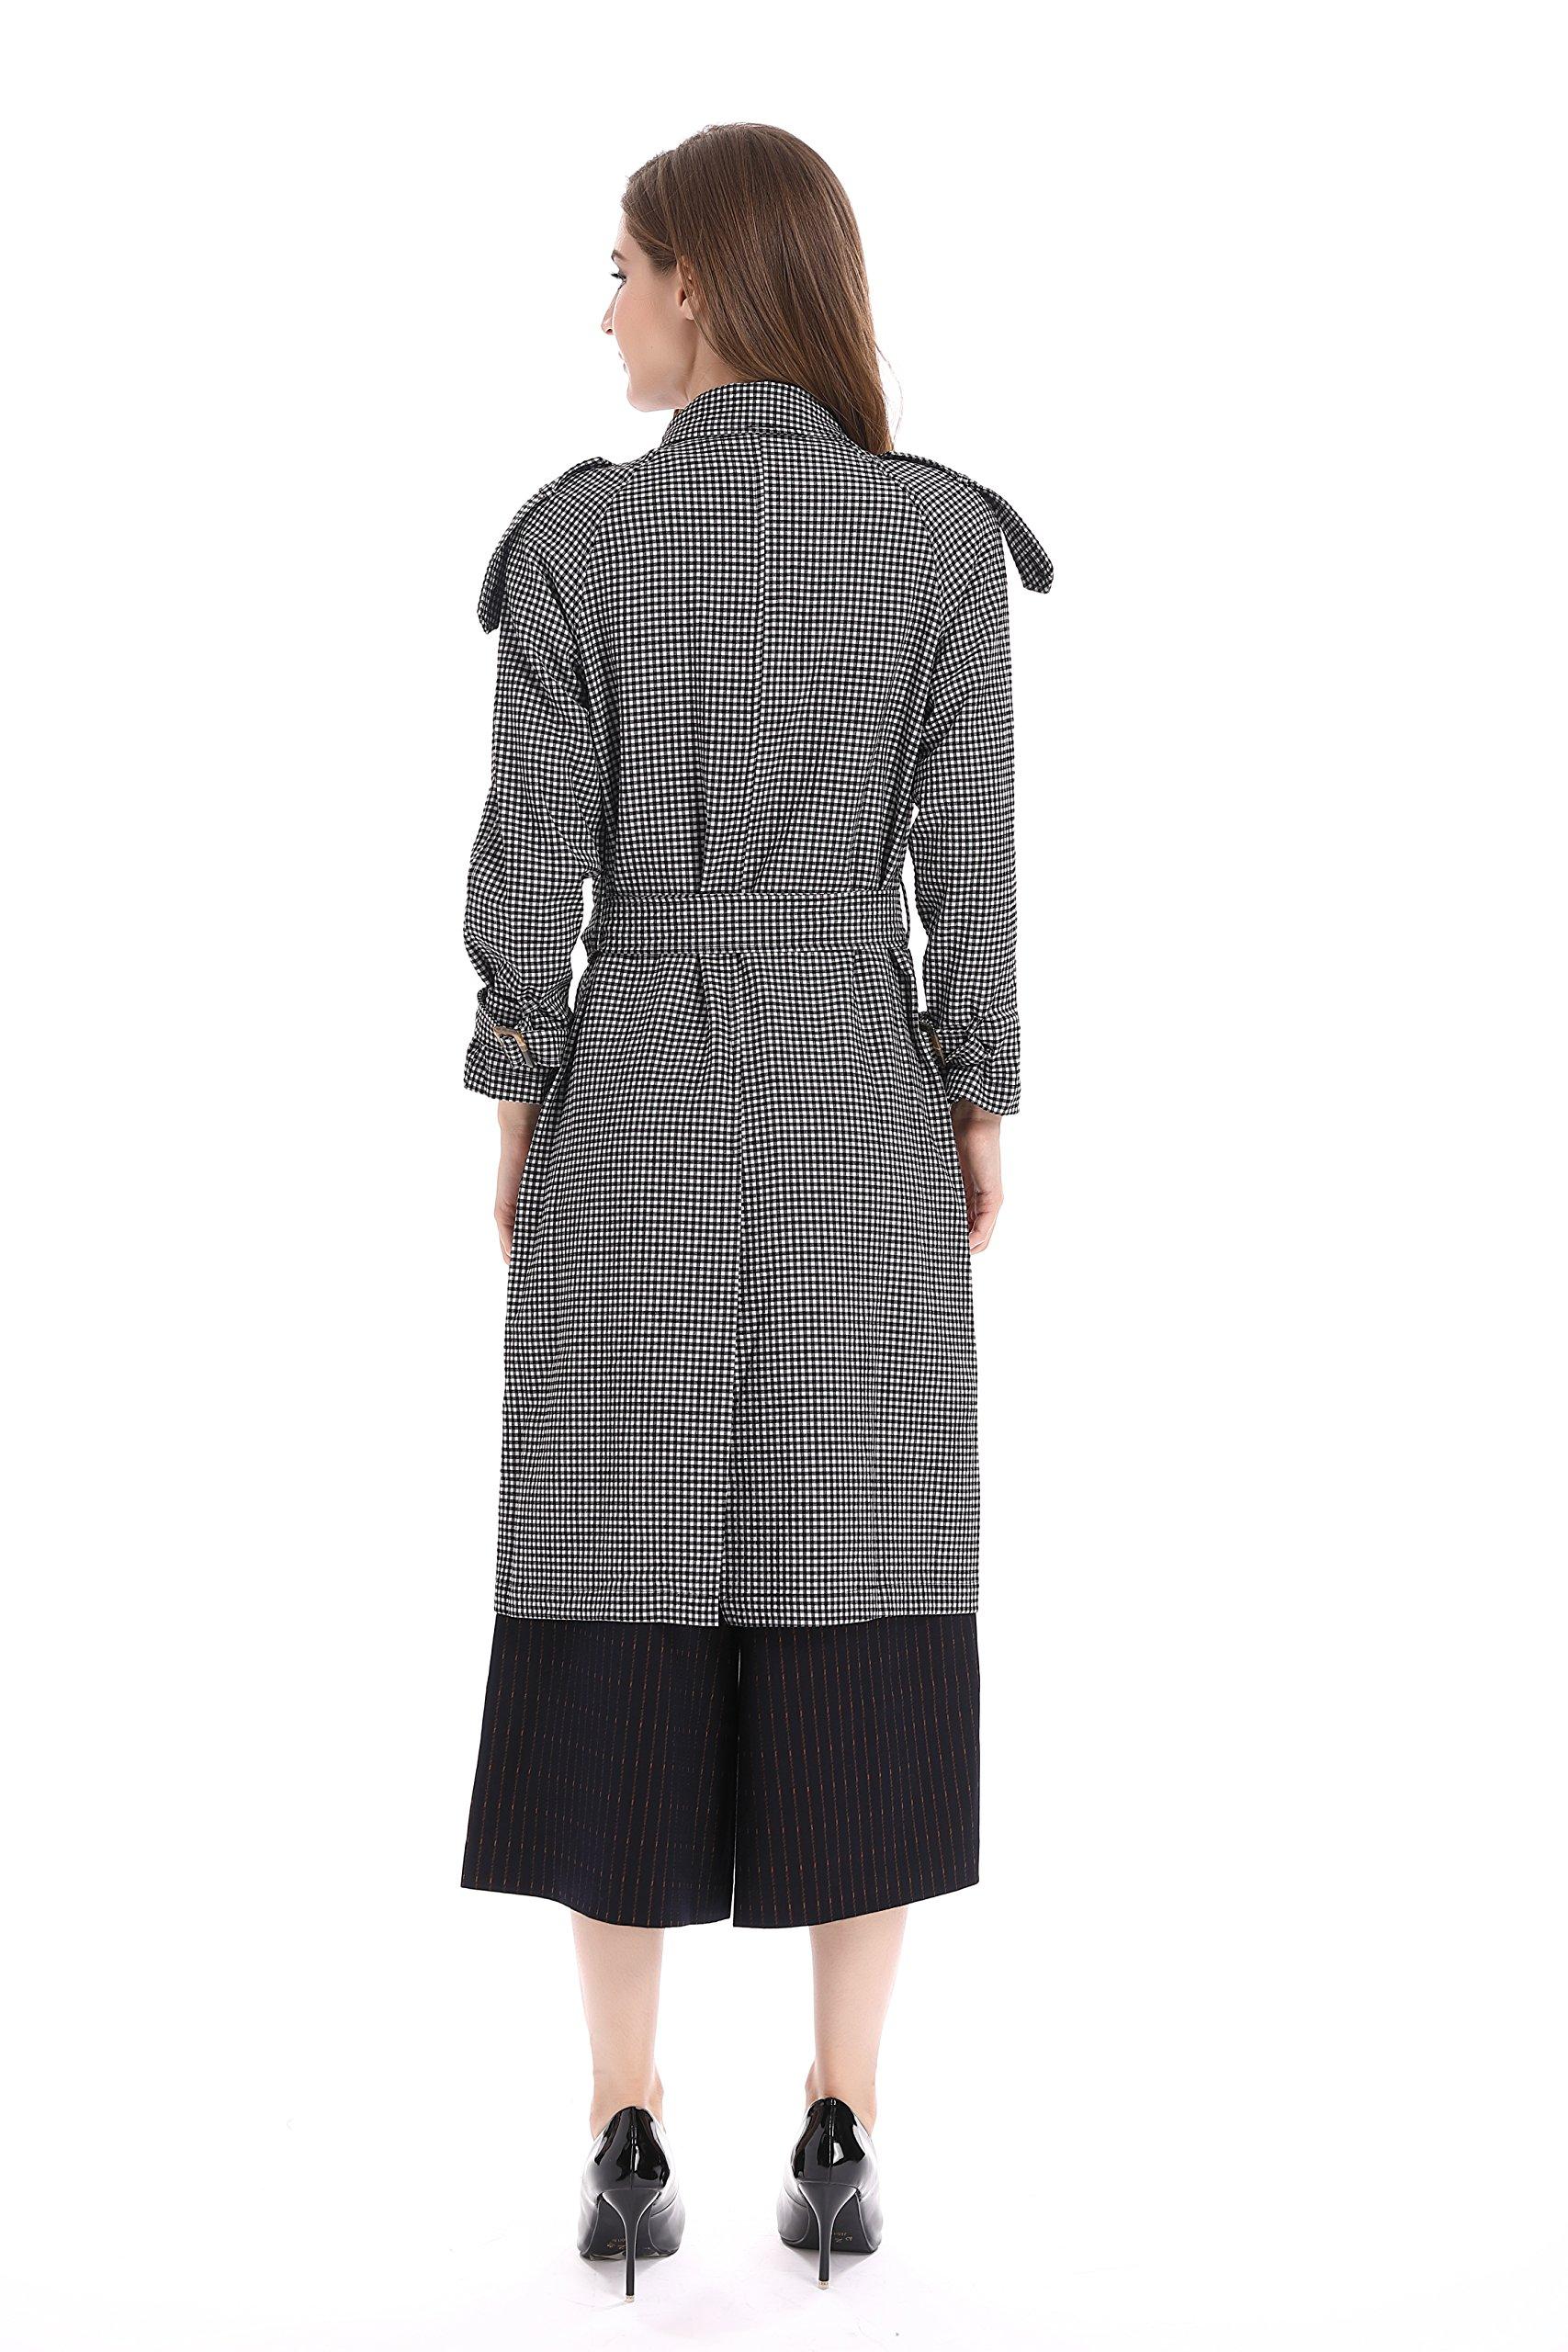 Bluemary Women's Fashion Fine Plaid Long Trench Coat With a Belt (medium, Greyish White) by Bluemary (Image #2)